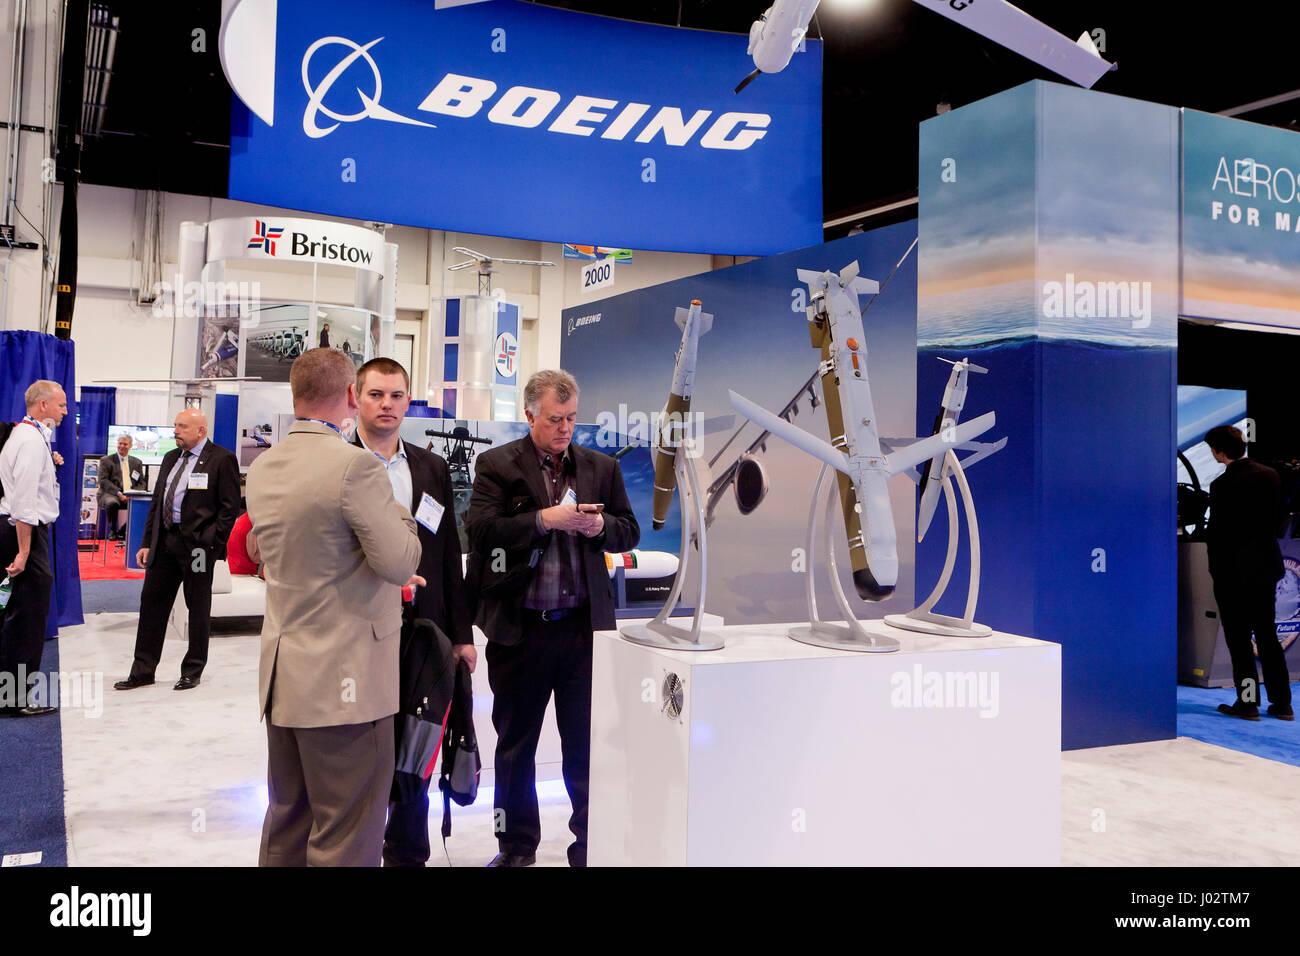 Expo Exhibition Stands Washington Dc : Arms expo stock photos arms expo stock images alamy